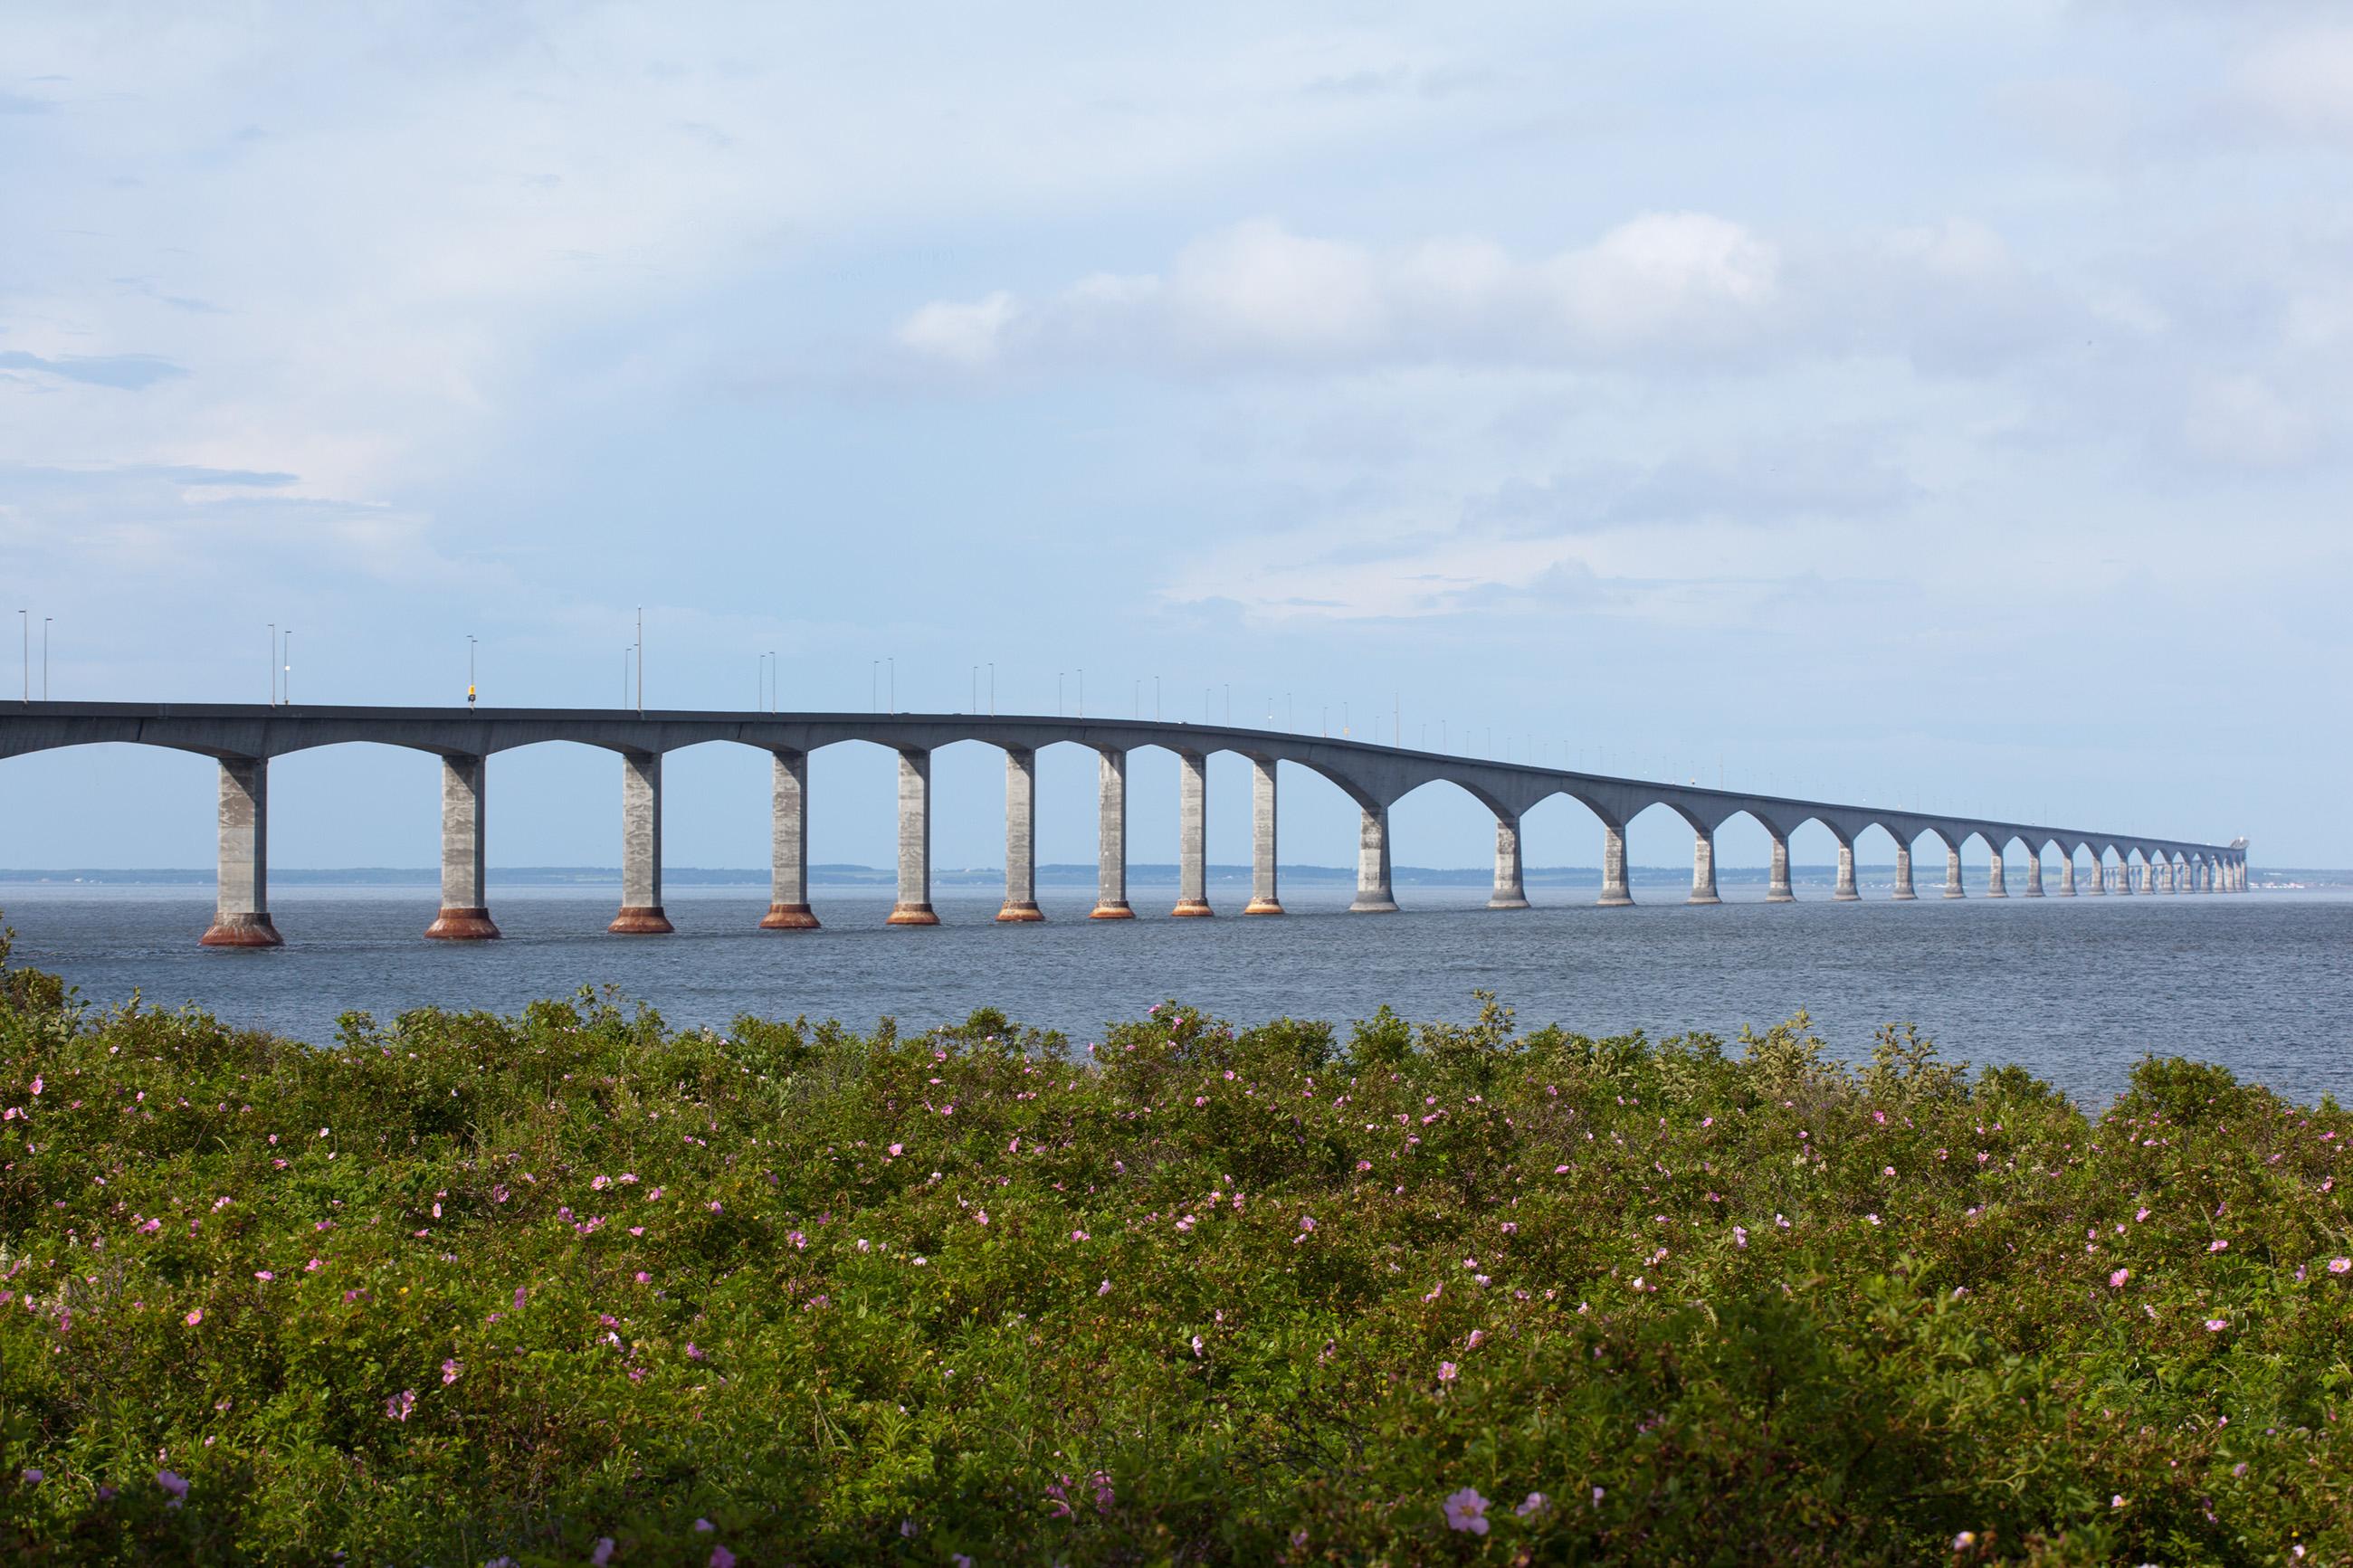 Bridge, Atlantic, New, Travel, Transportation, HQ Photo